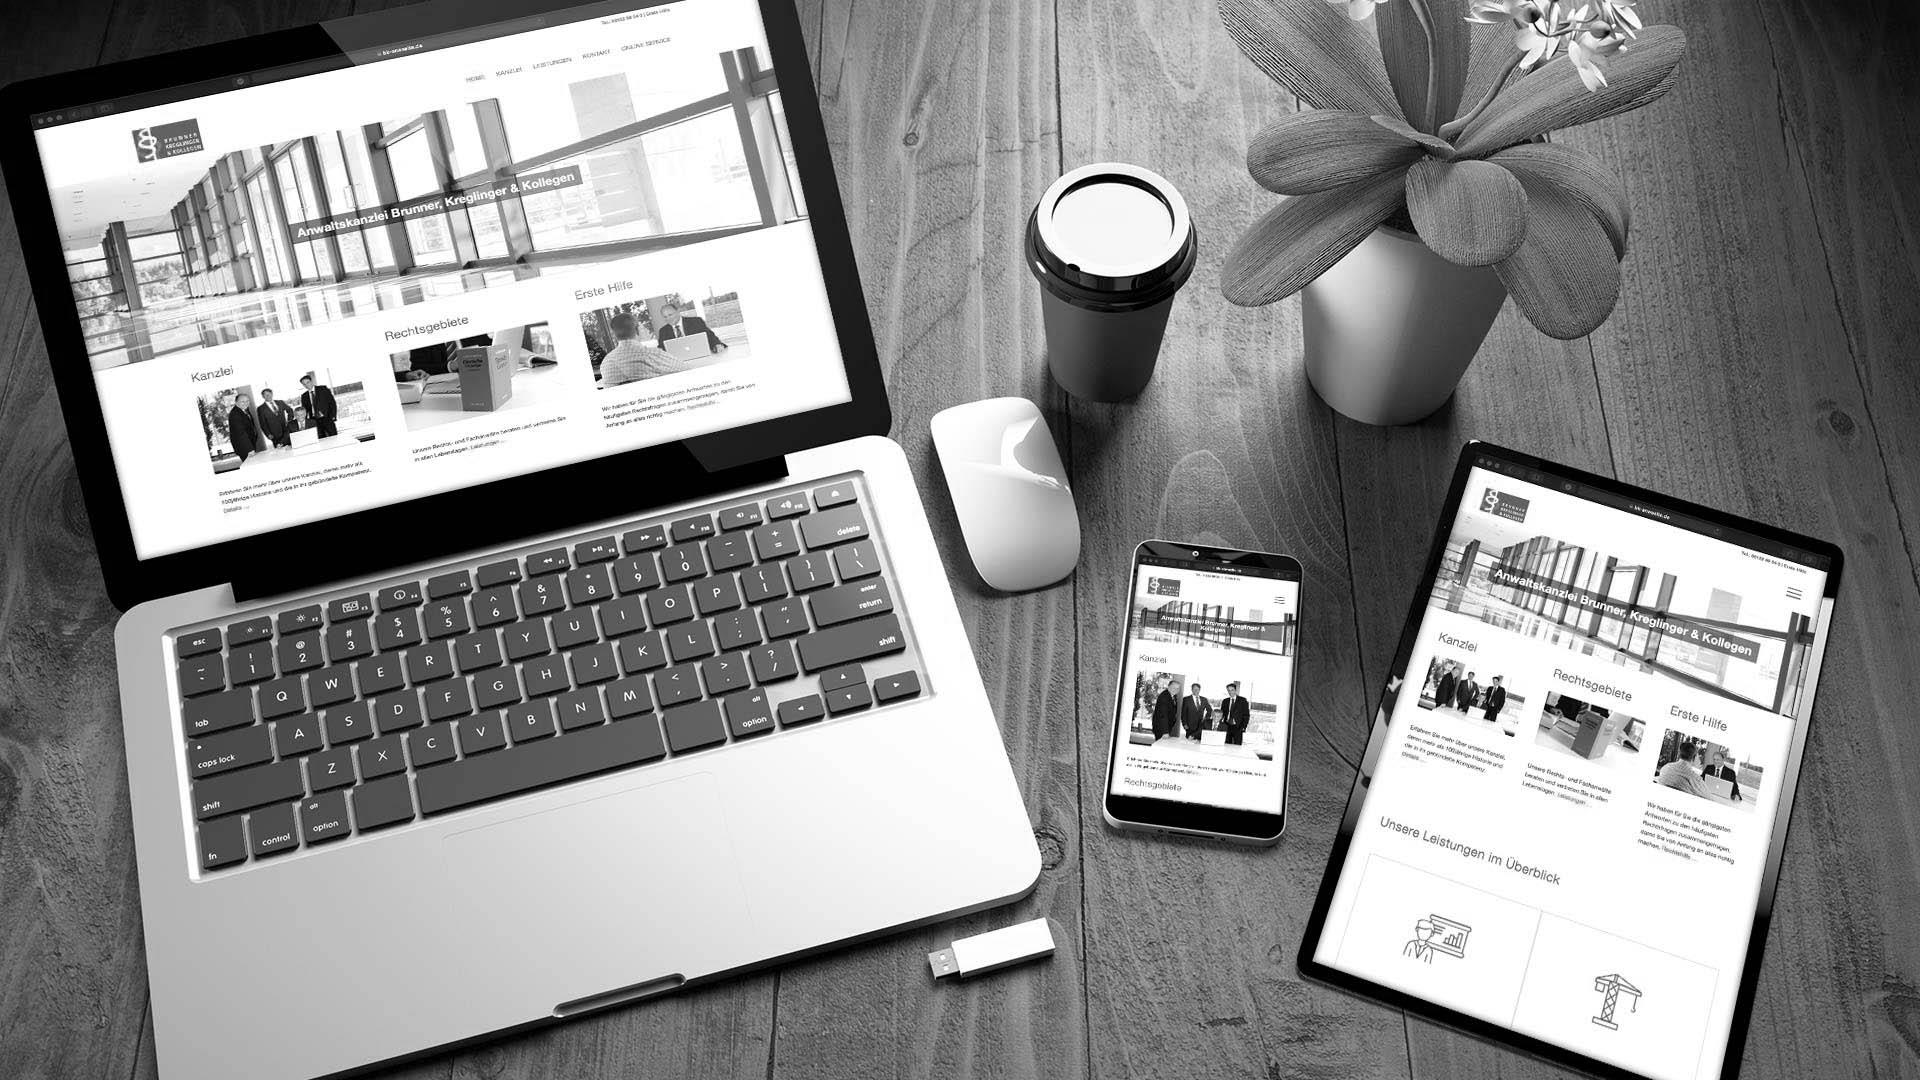 Anwaltskanzlei Webdesign & SEO